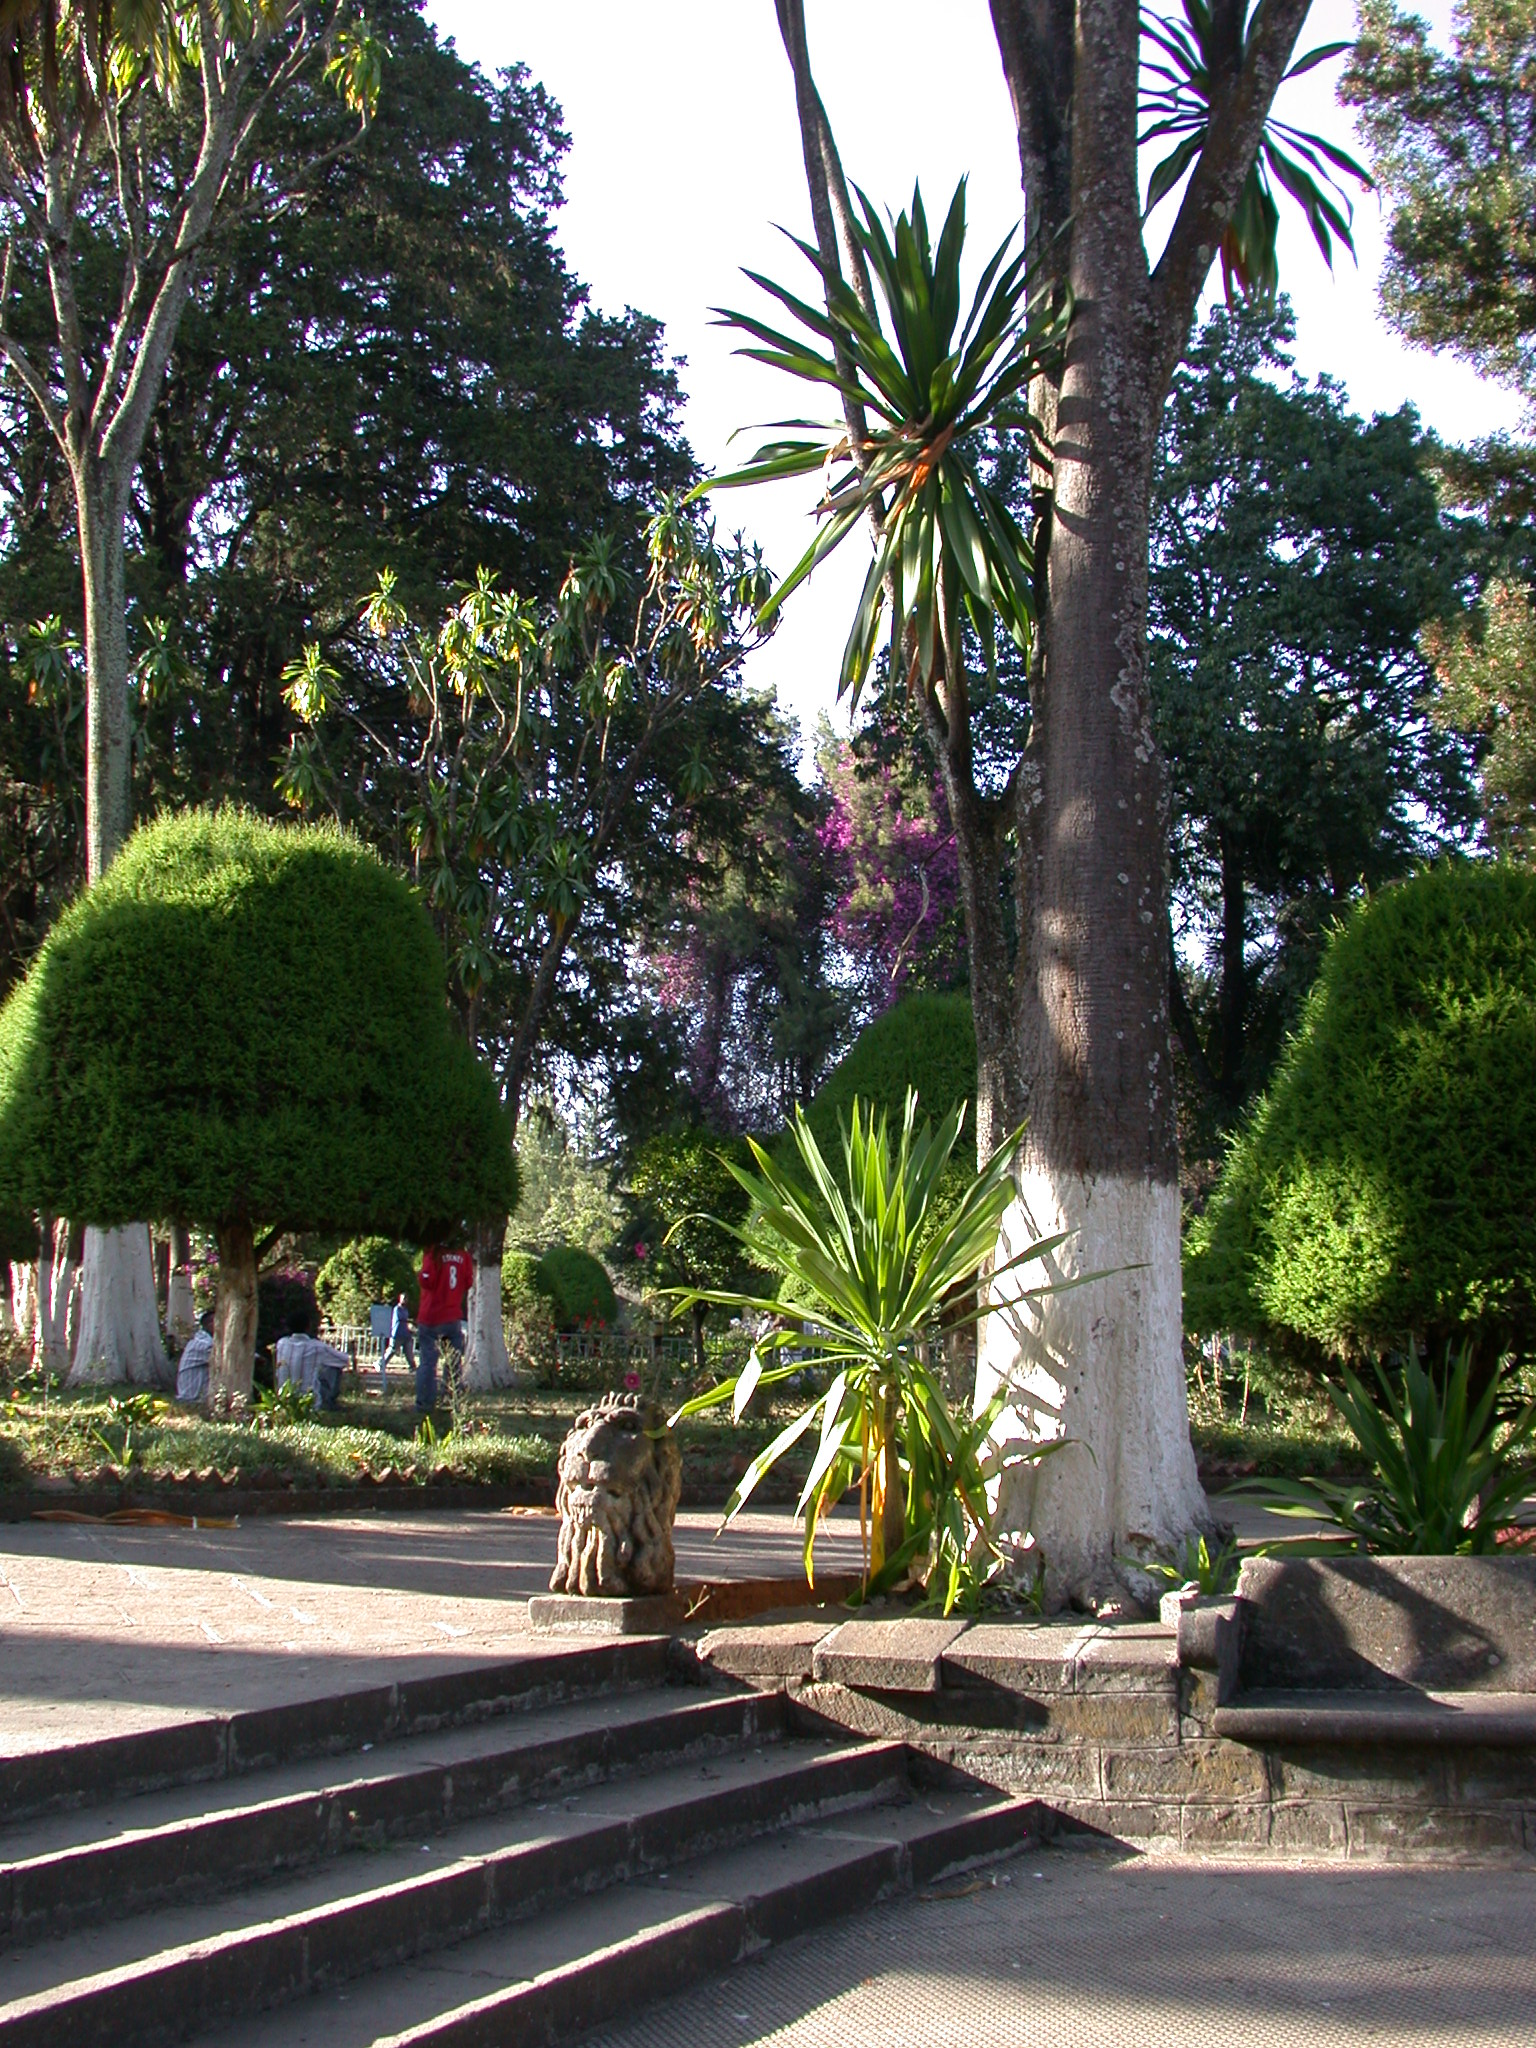 Grounds of Addis Ababa University, Addis Ababa, Ethiopia